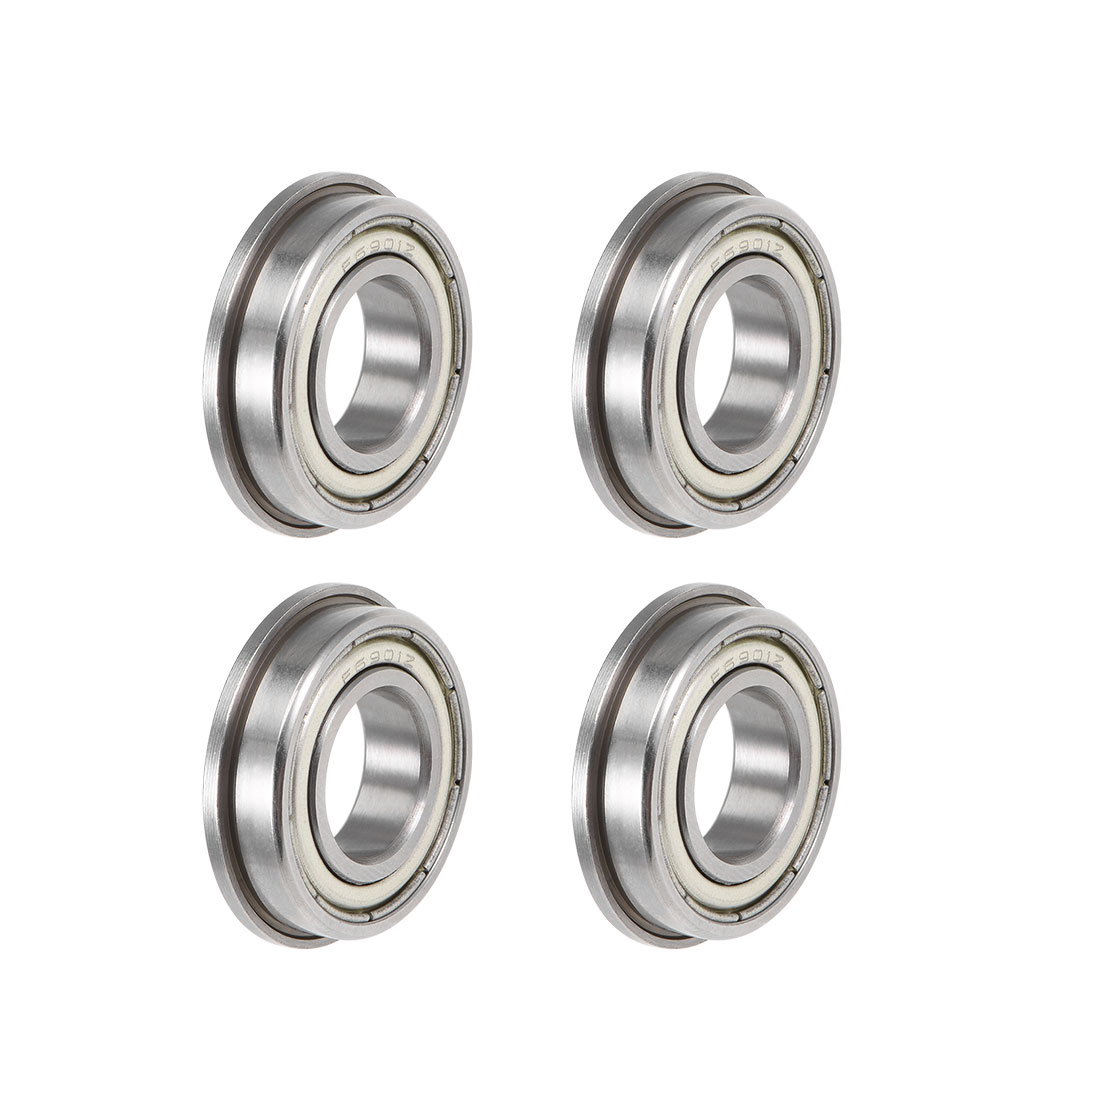 Uxcell F6901ZZ Flange Ball Bearing 12x26x6mm Shielded Chrome Bearings 4pcs